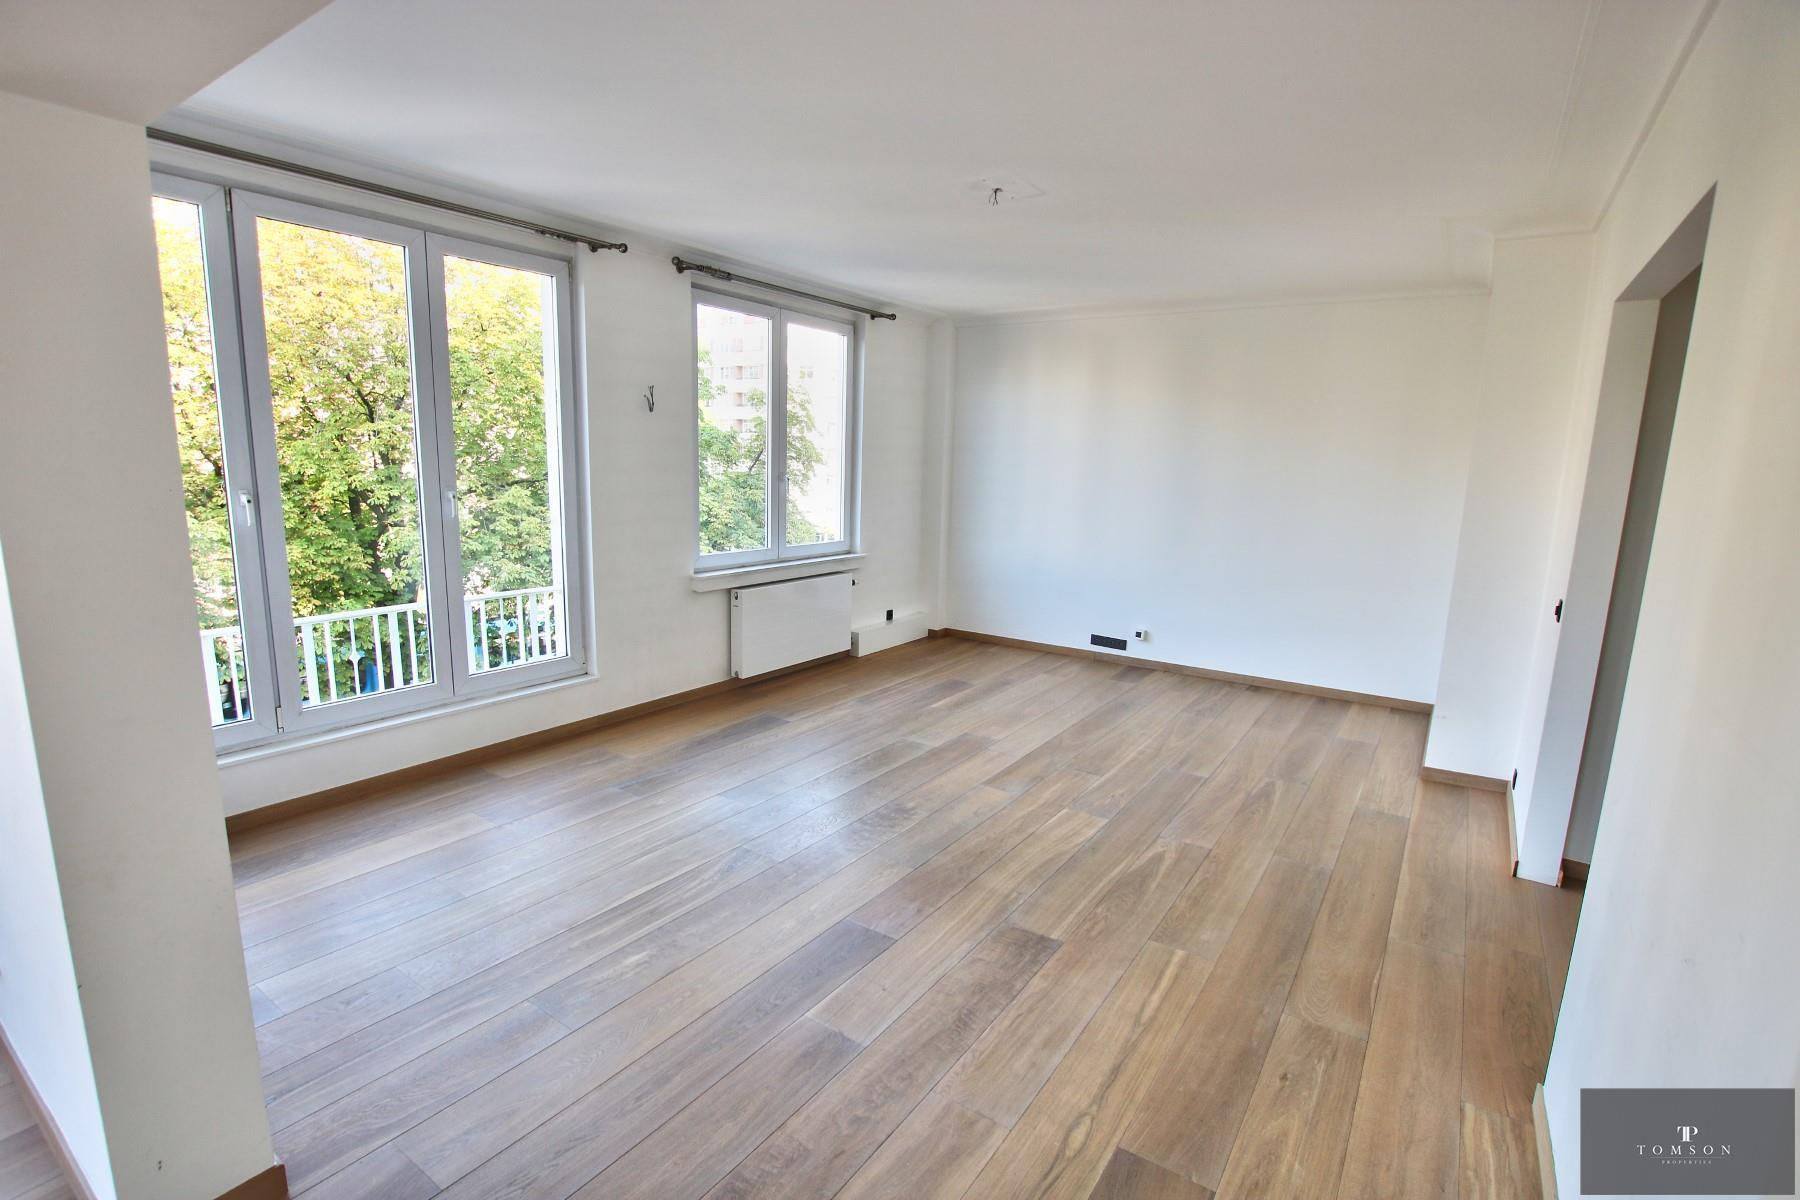 Flat - Etterbeek - #4154759-3